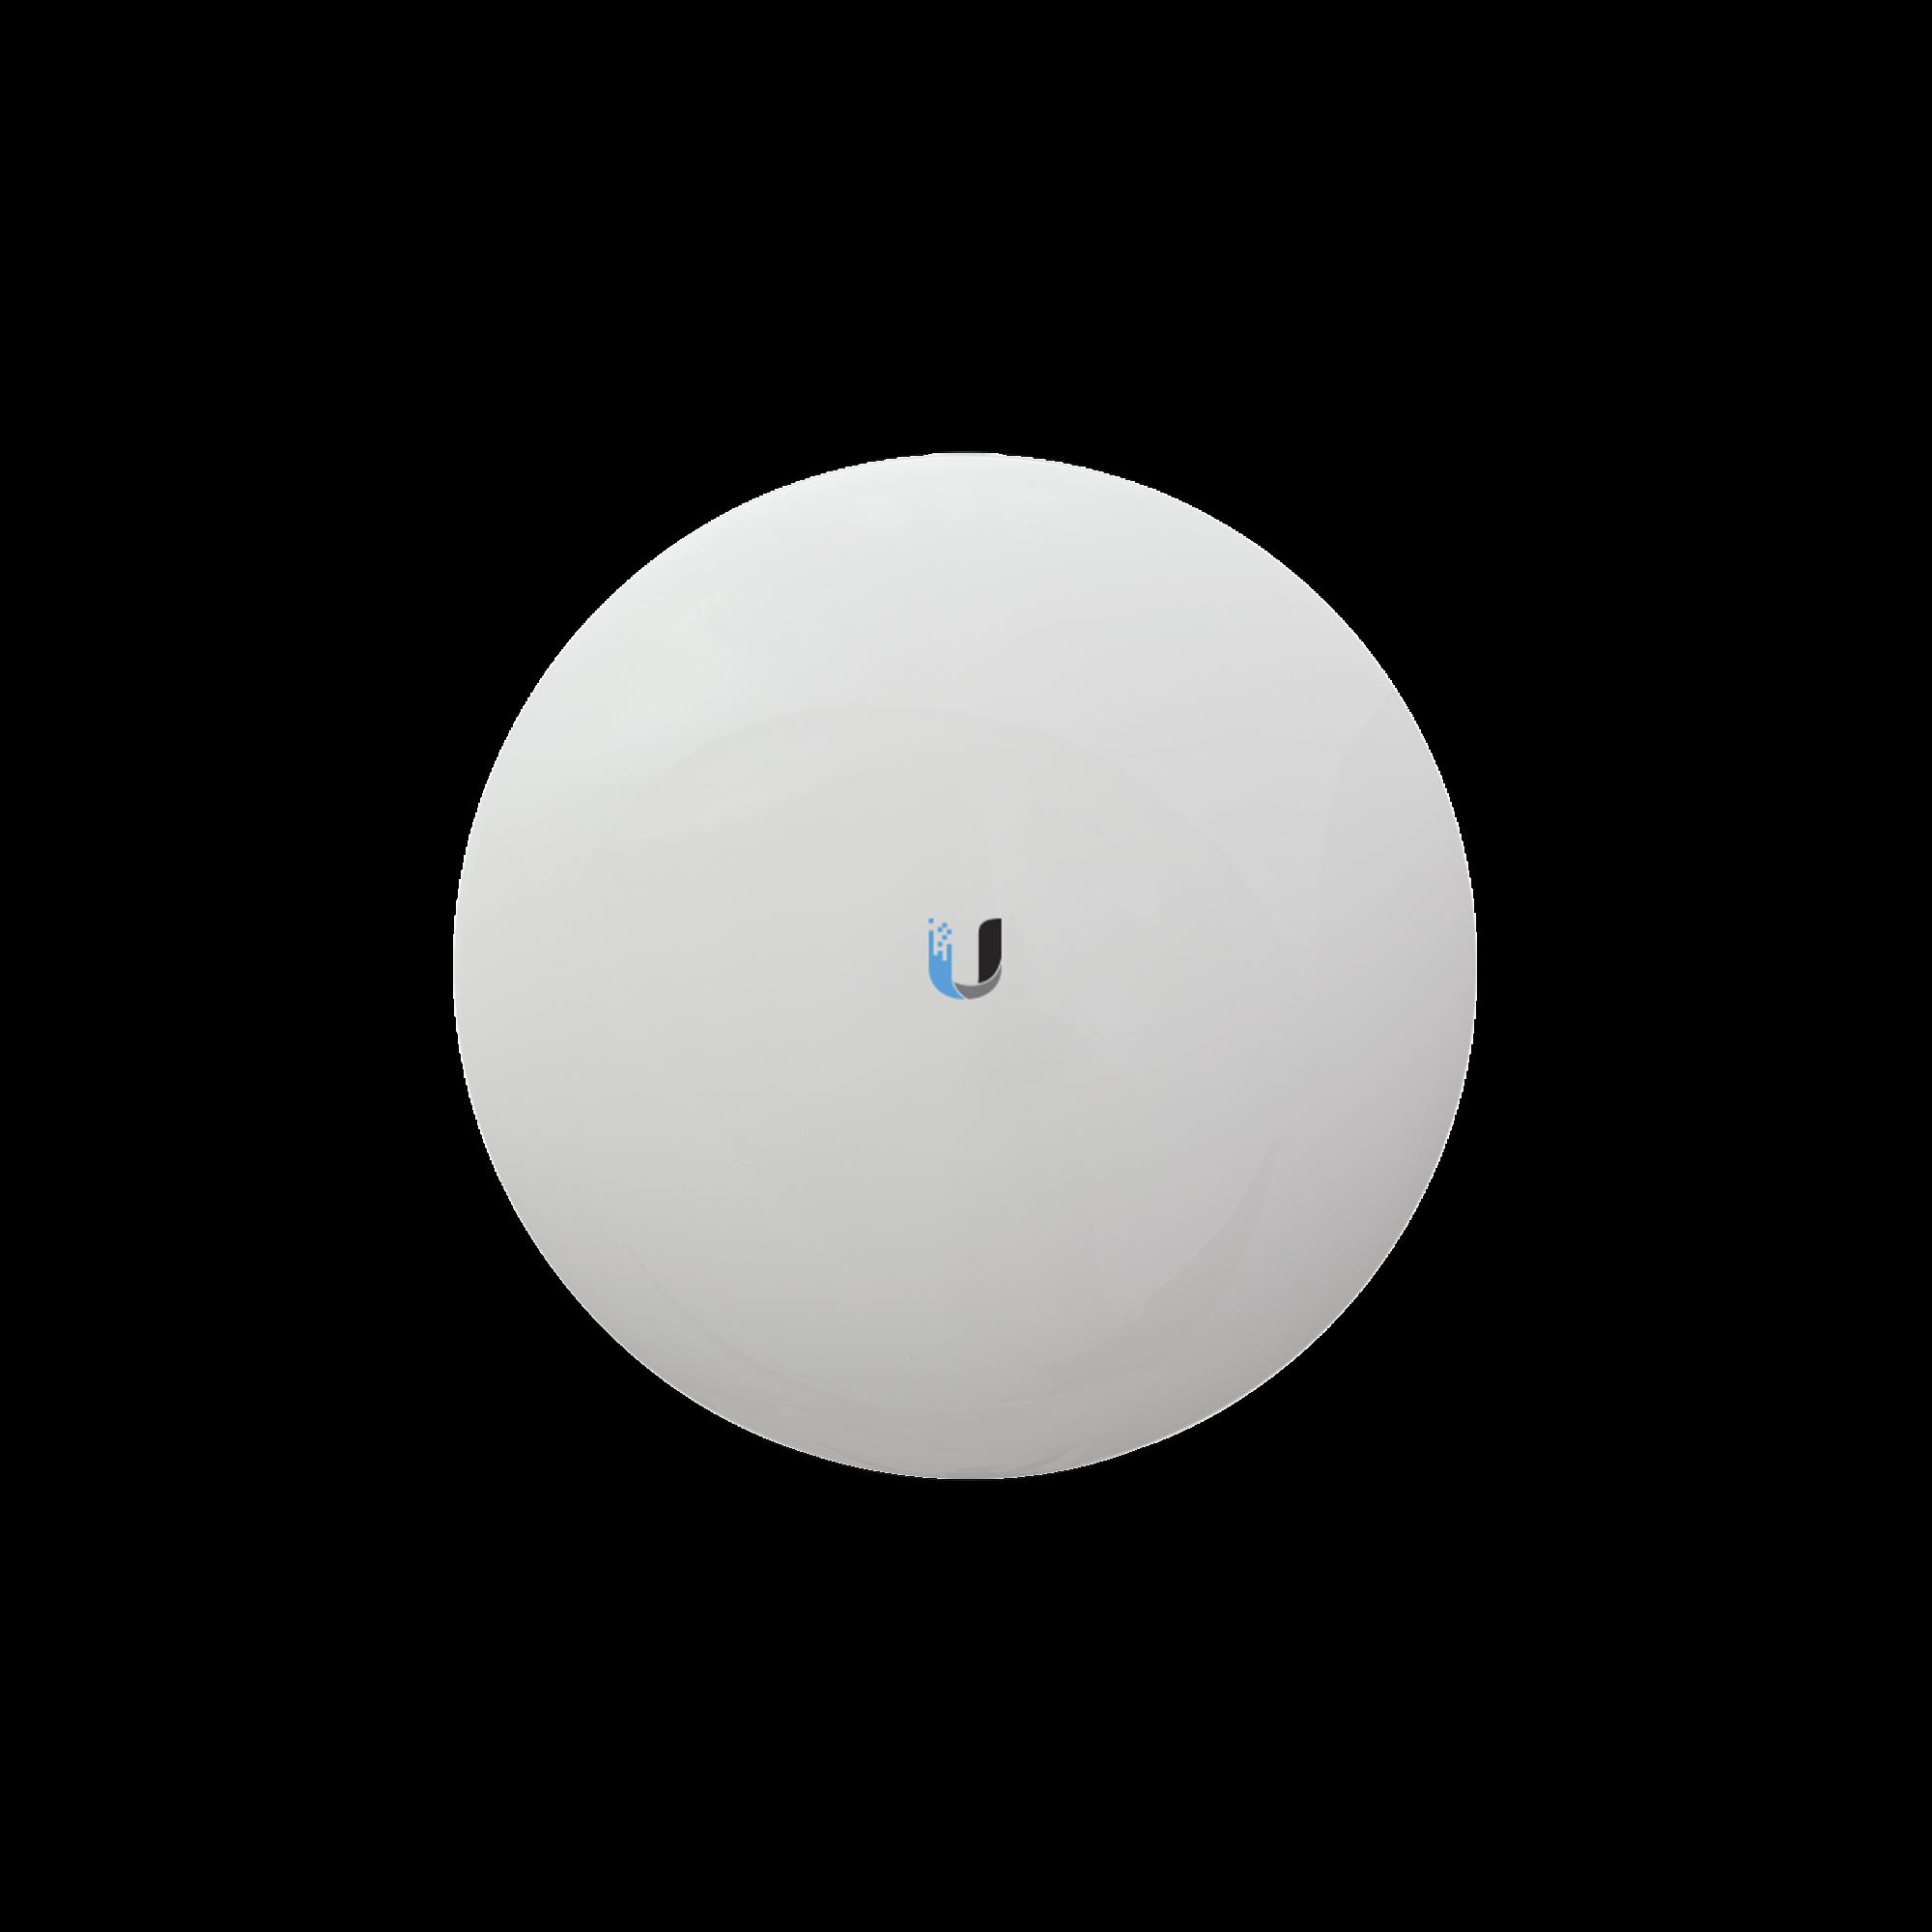 NanoBeam airMAX AC CPE hasta 330 Mbps, 2 GHz (2412 - 2472 MHz) con antena integrada de 13 dBi